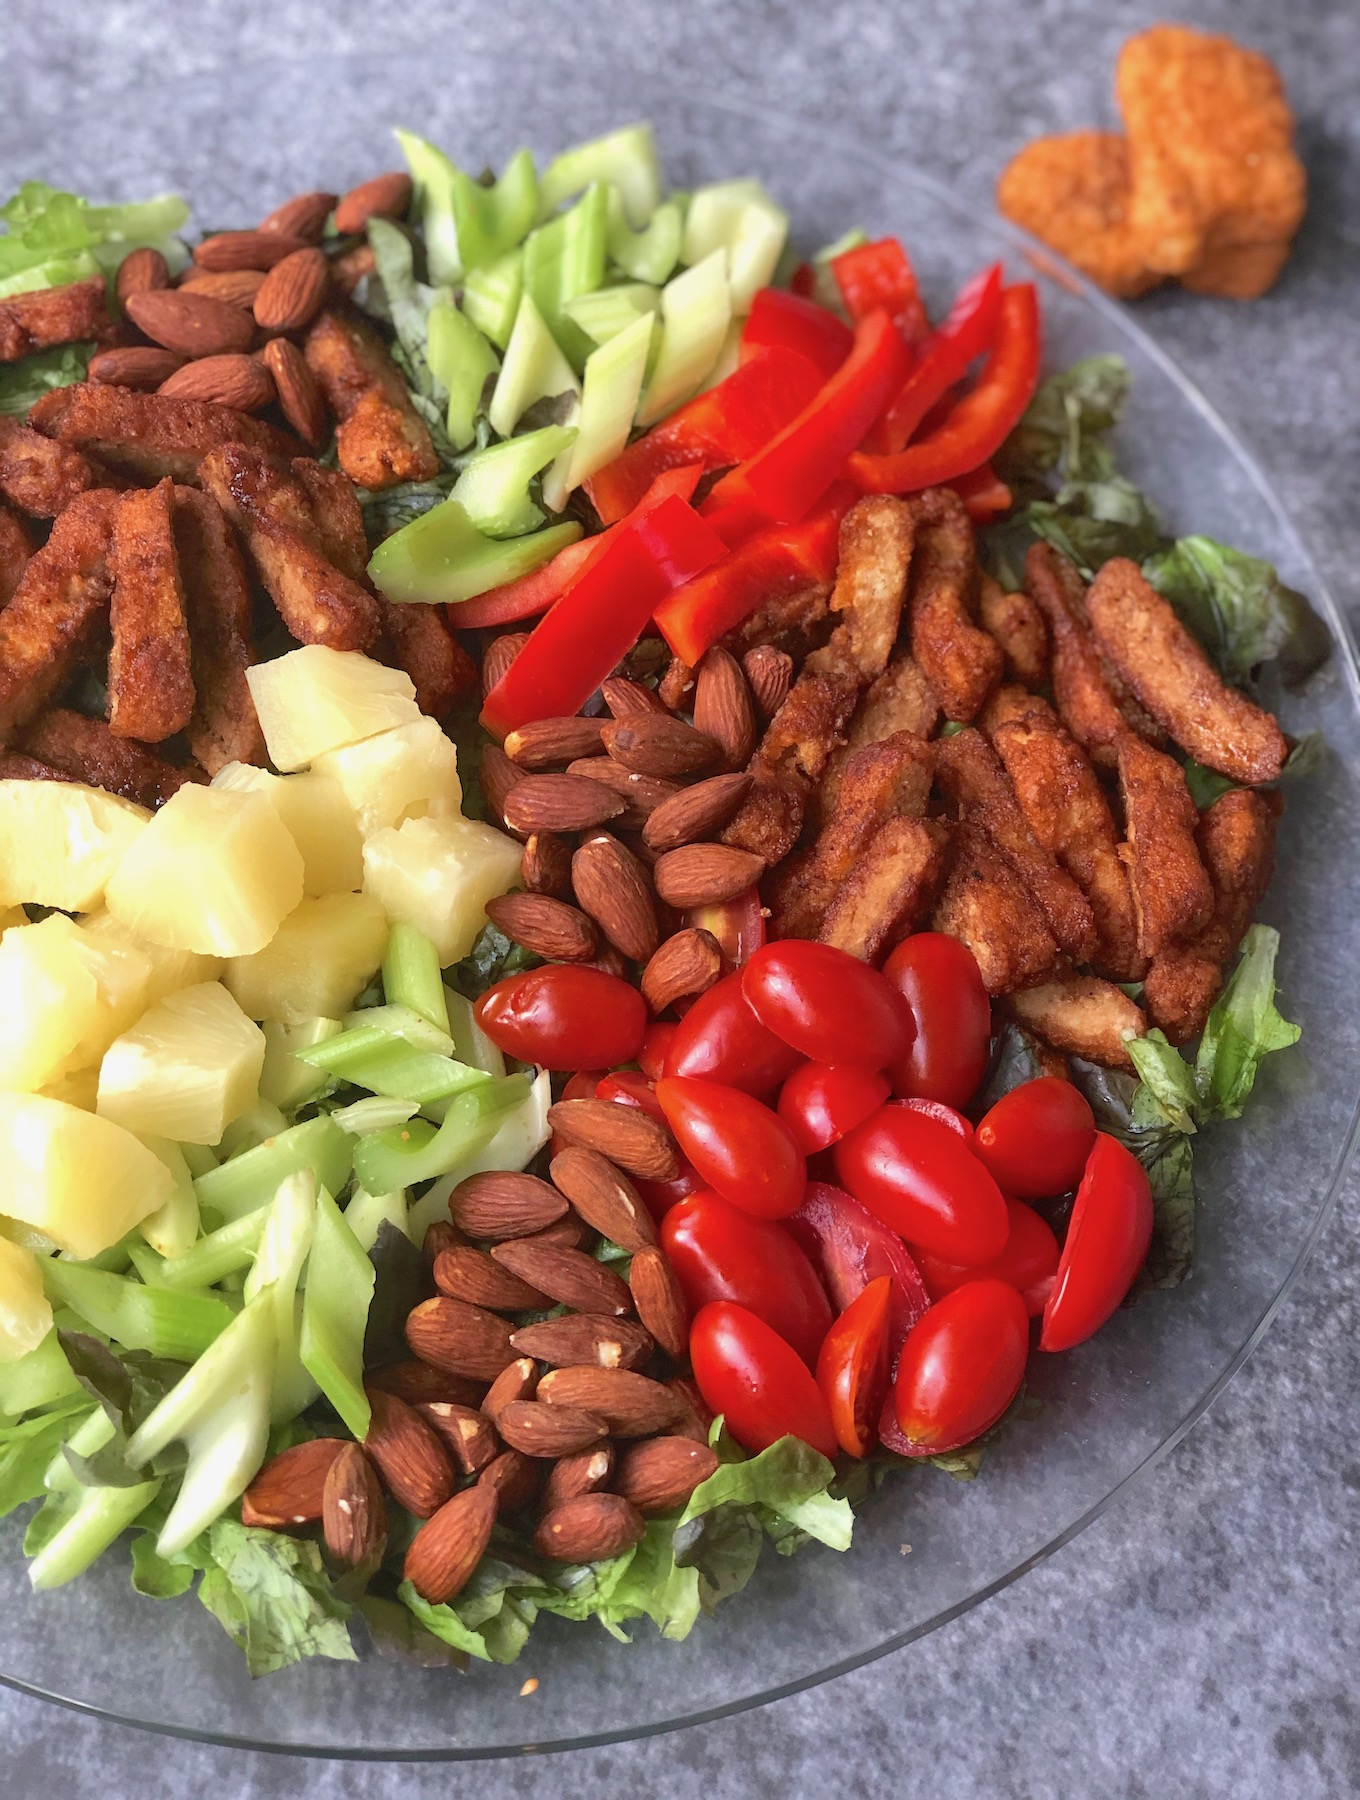 Vegan Teriyaki Chick'n Salad with Nuggs